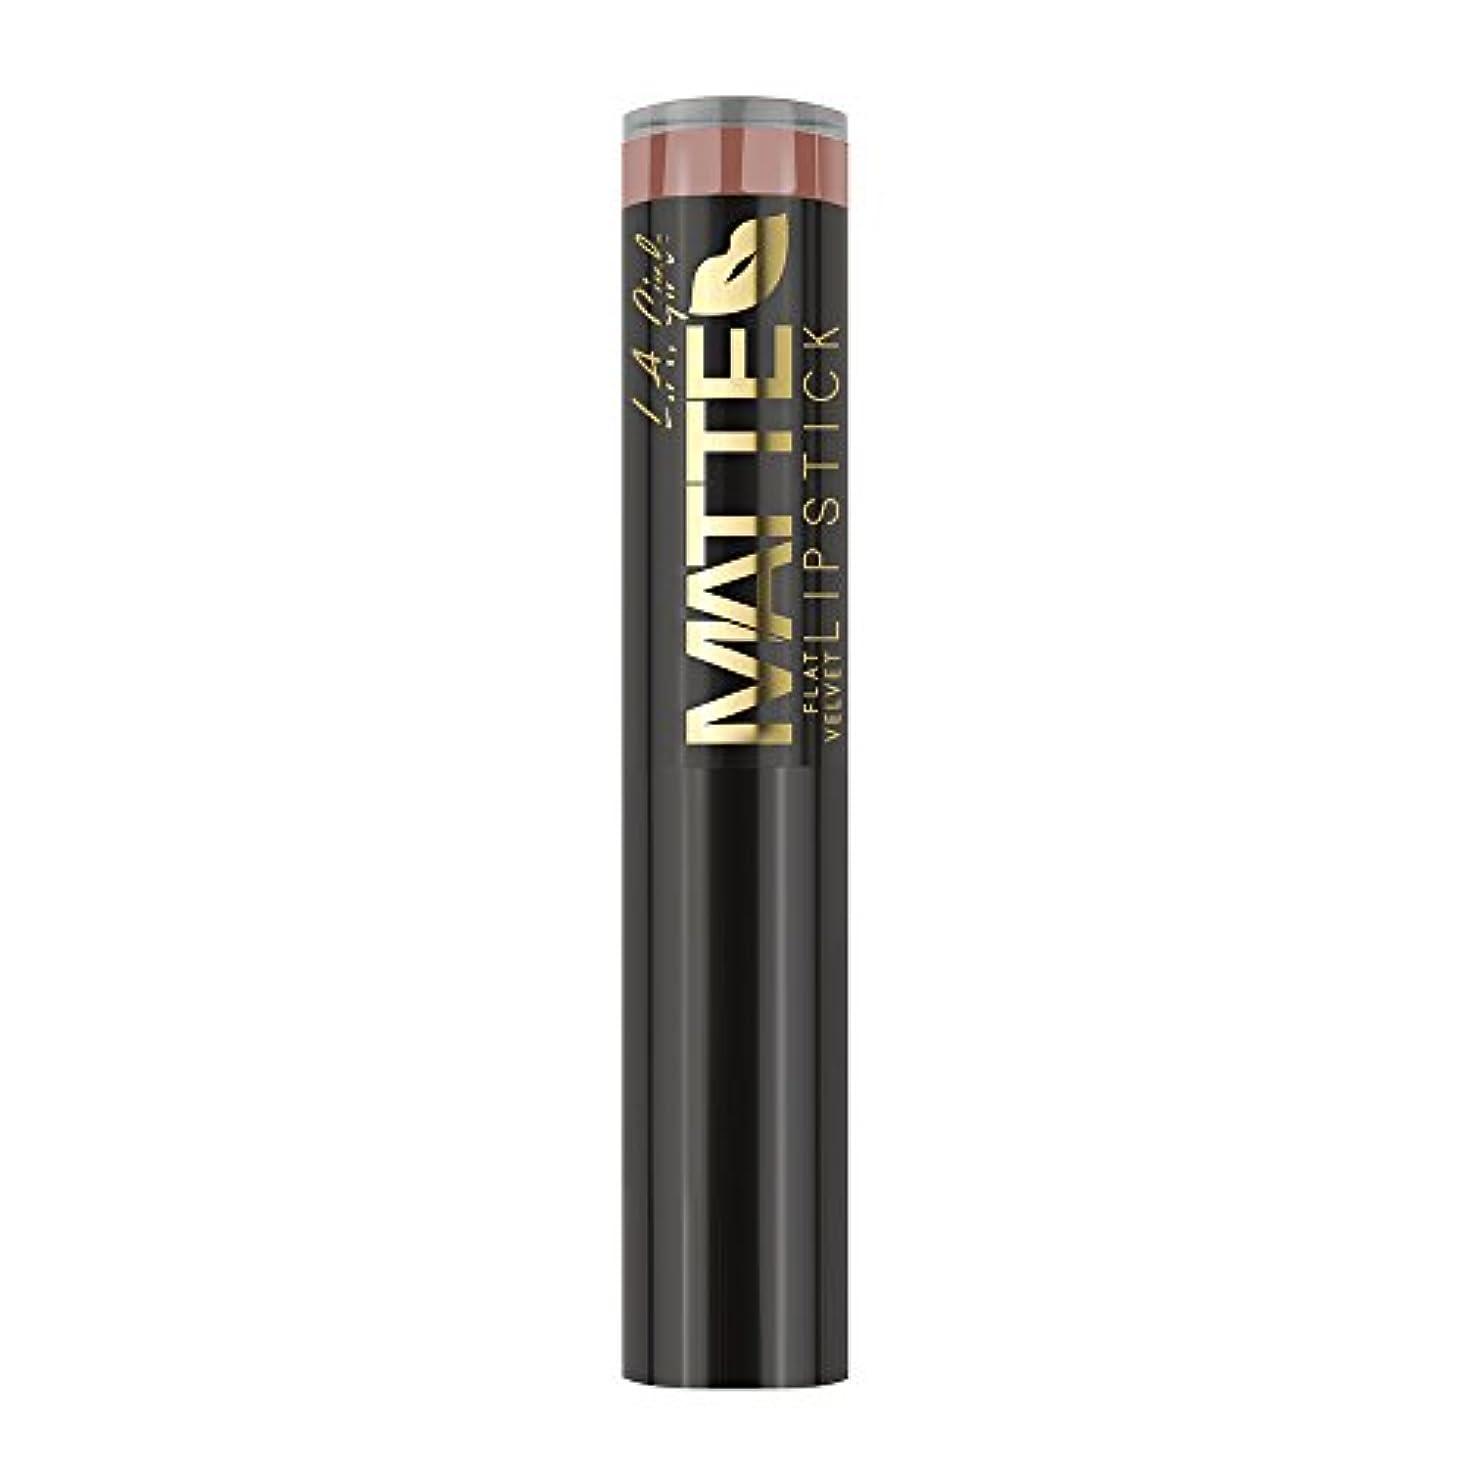 セラー裏切る失態L.A. GIRL Matte Flat Velvet Lipstick Snuggle (並行輸入品)